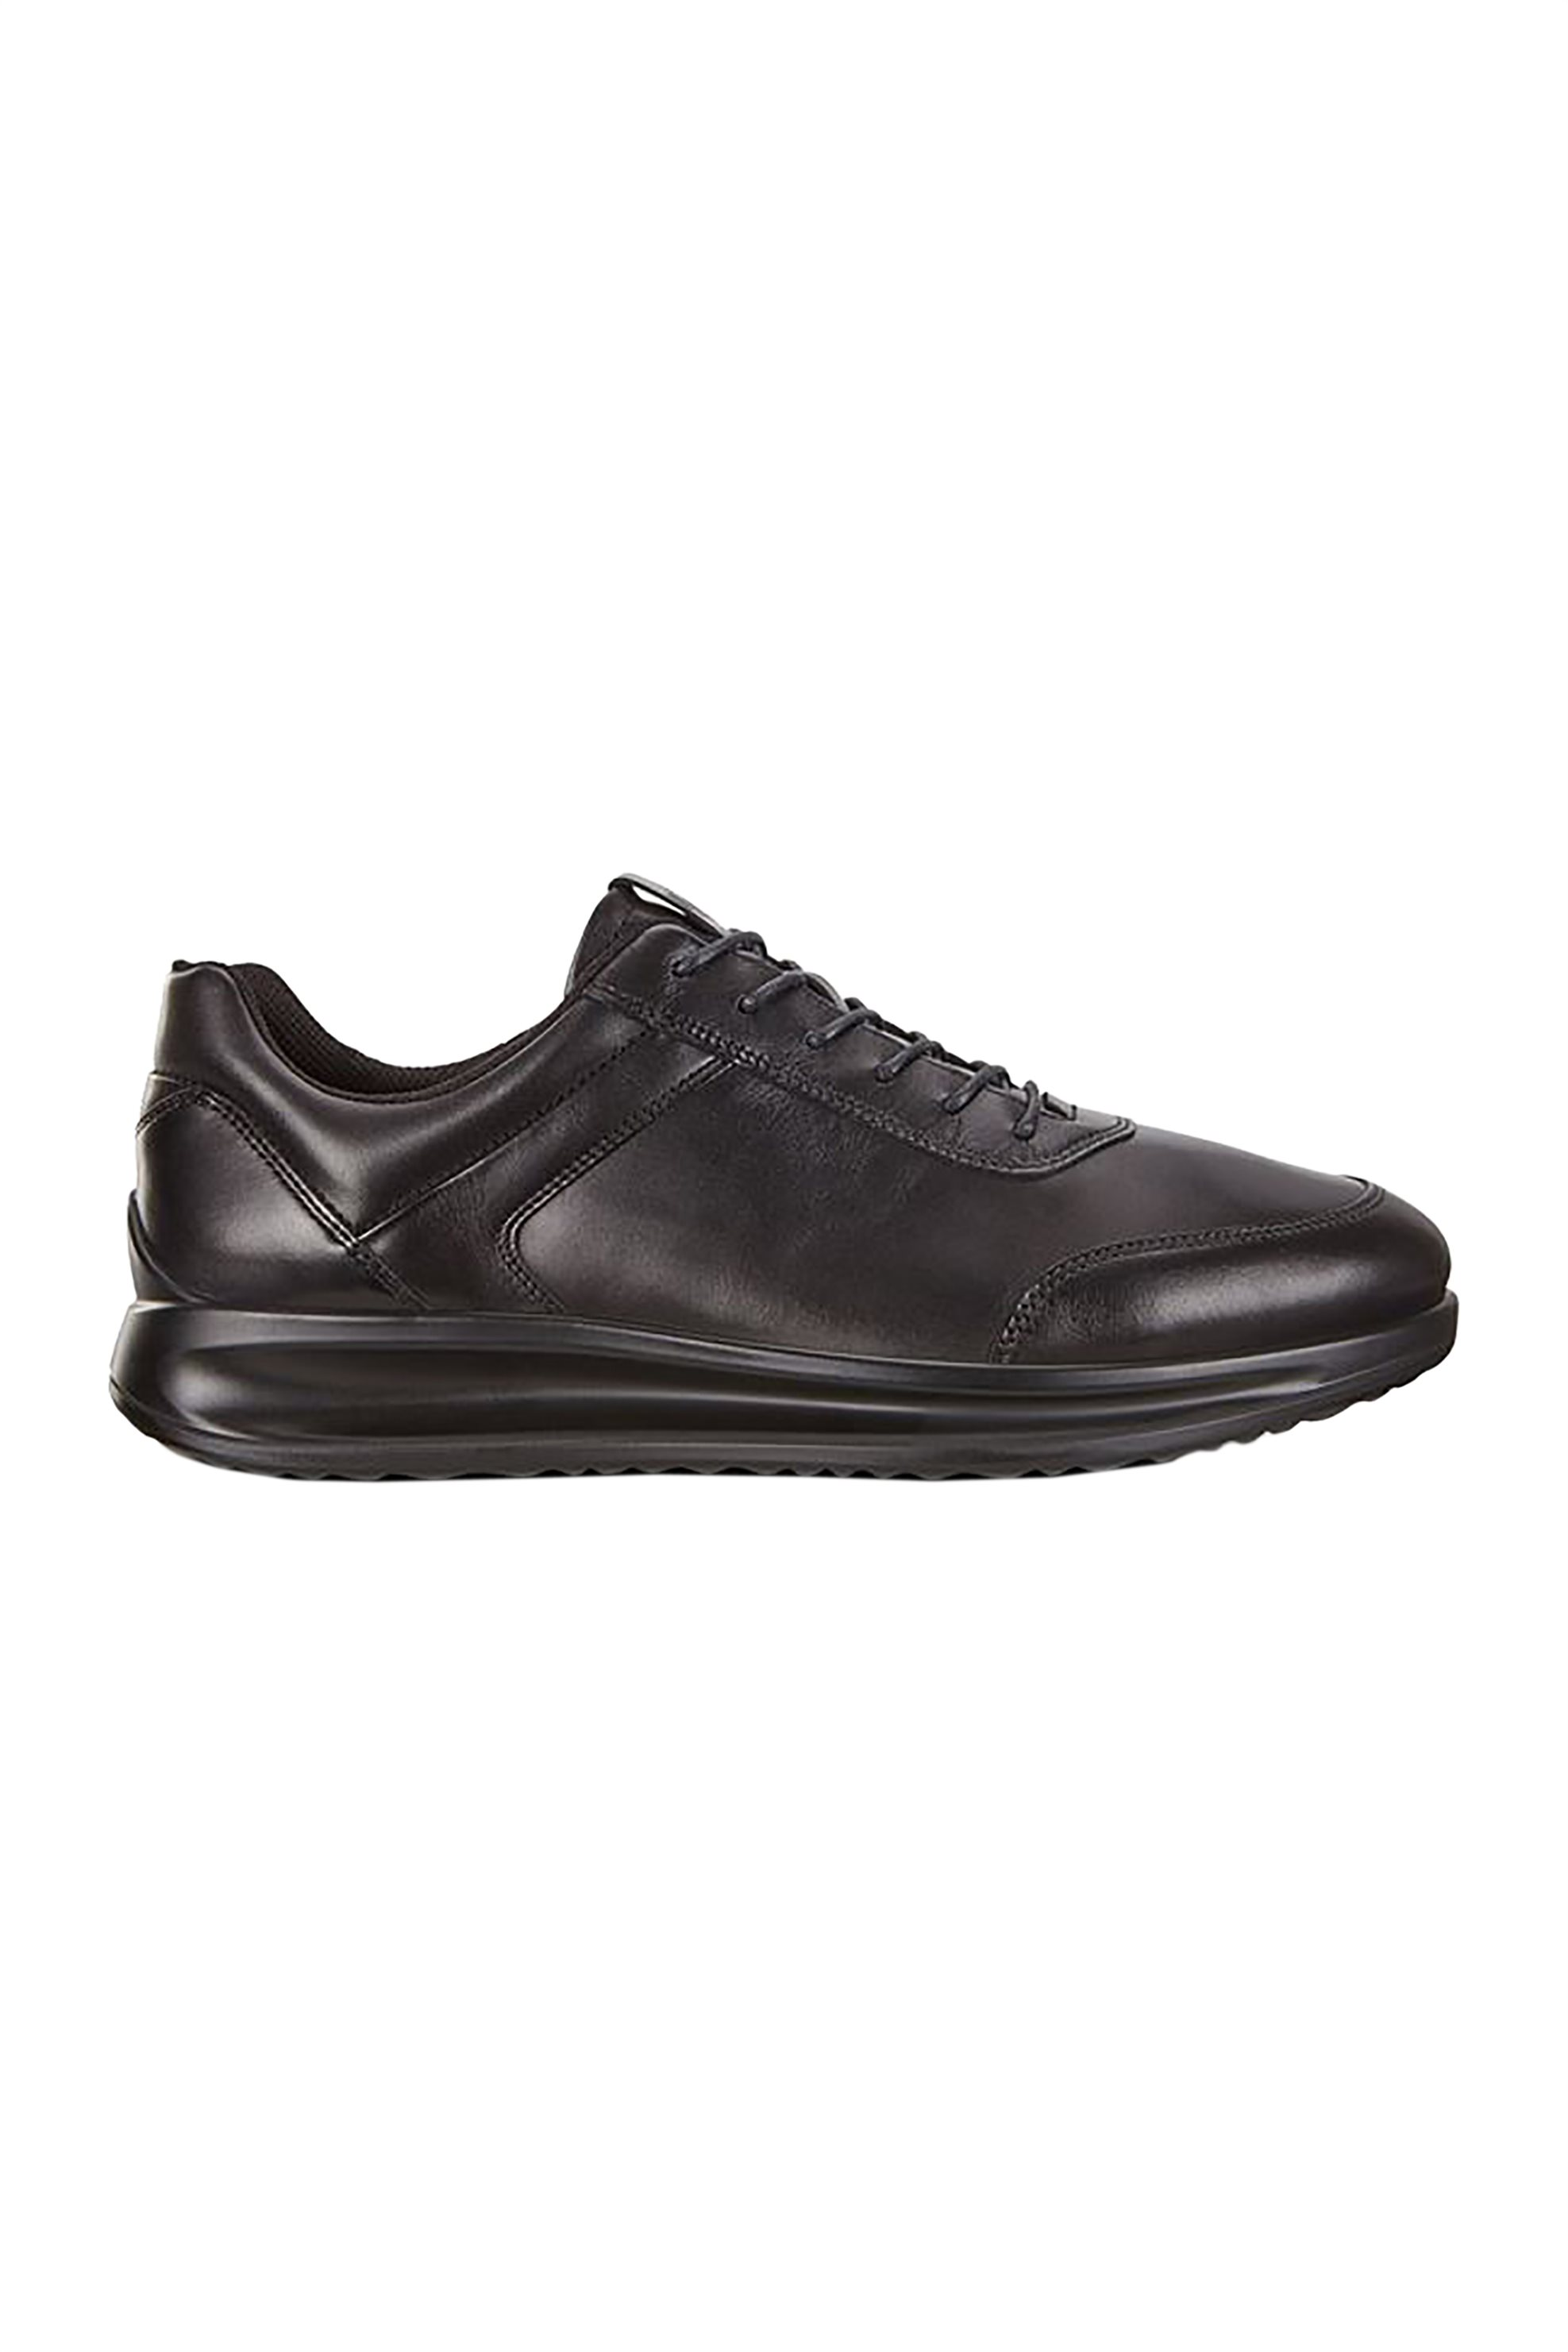 "ECCO ανδρικά δερμάτινα sneakers ""Aquet"" – 989-207124 01001 – Μαύρο"